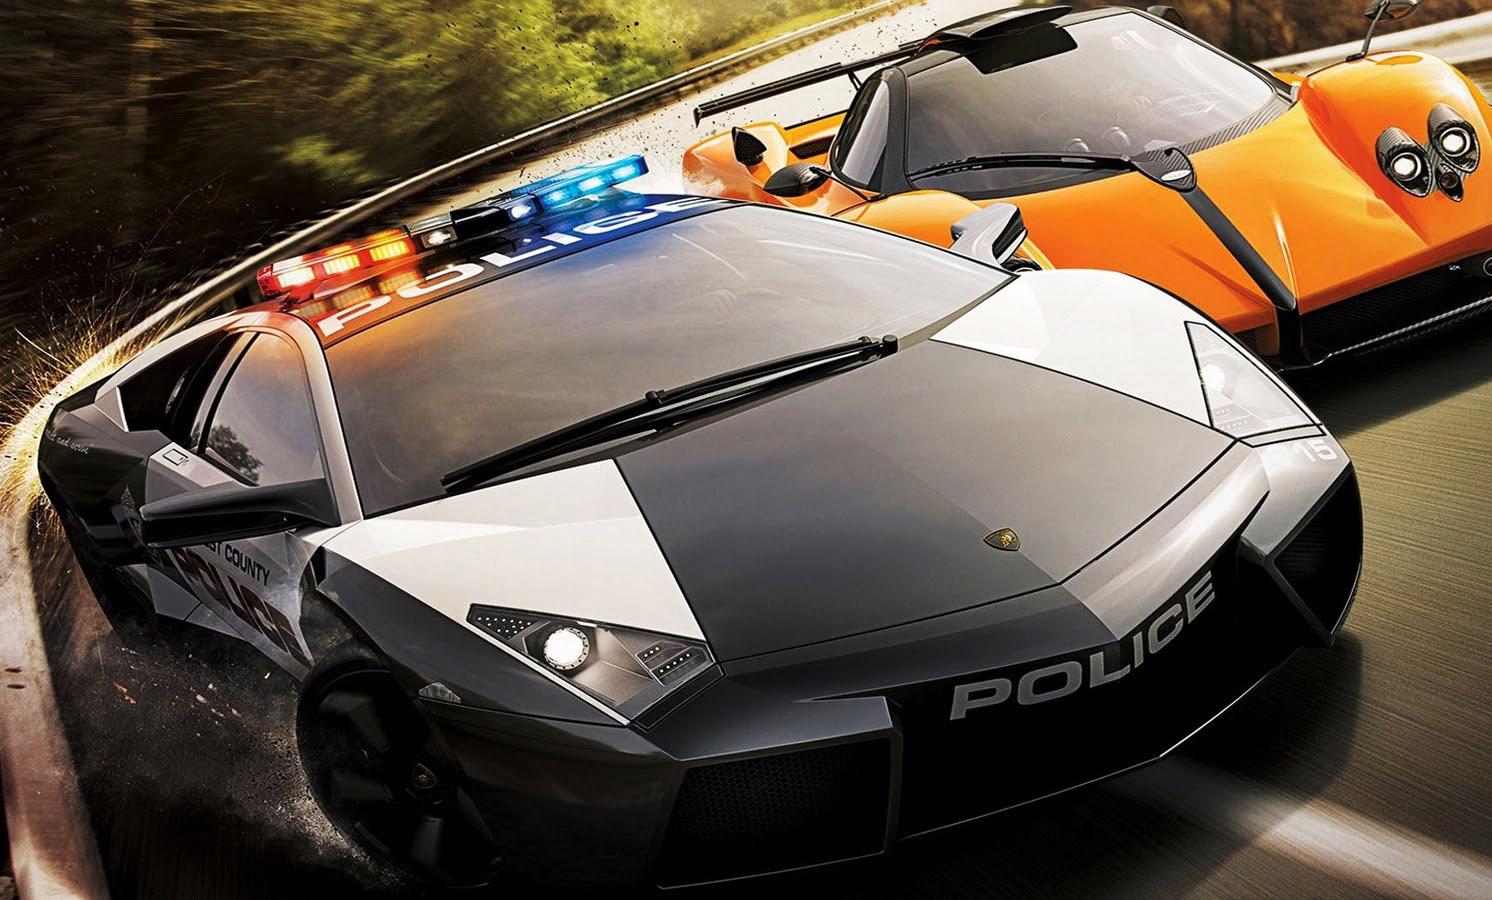 Lamborghini Reventon Wallpapers Part 4 Best Cars Hd